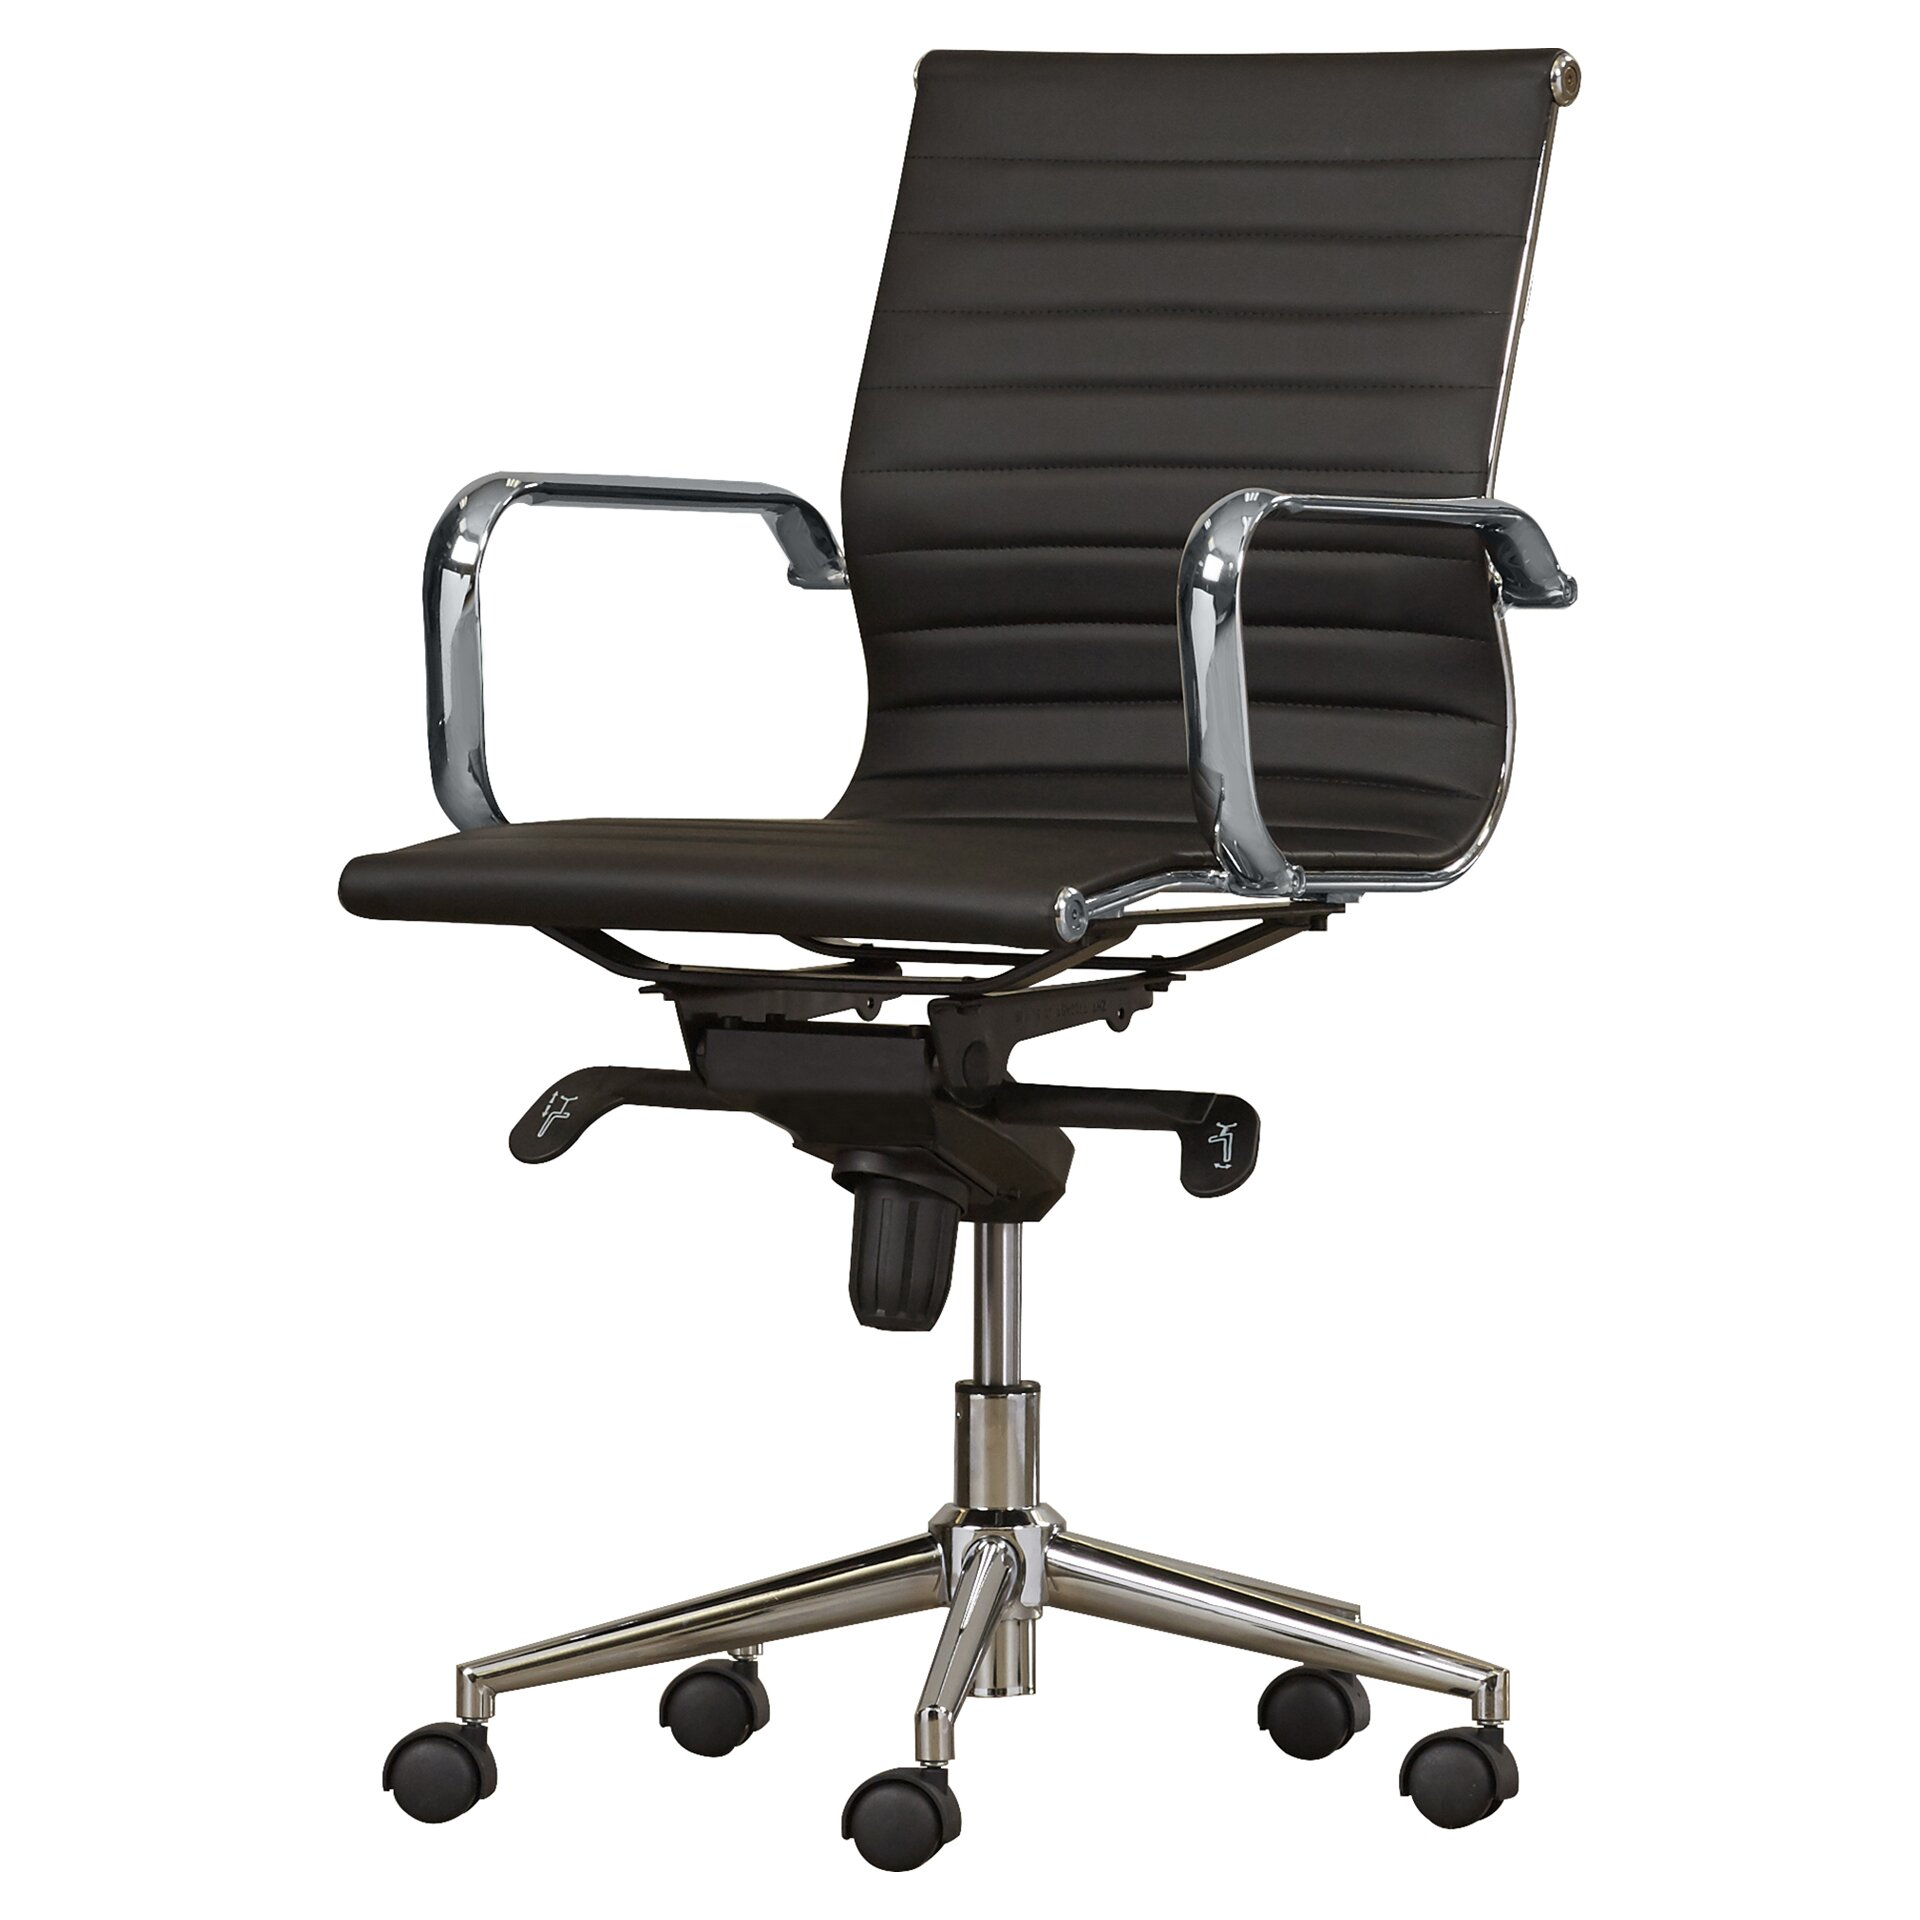 Desk Chairs Youll LoveWayfair